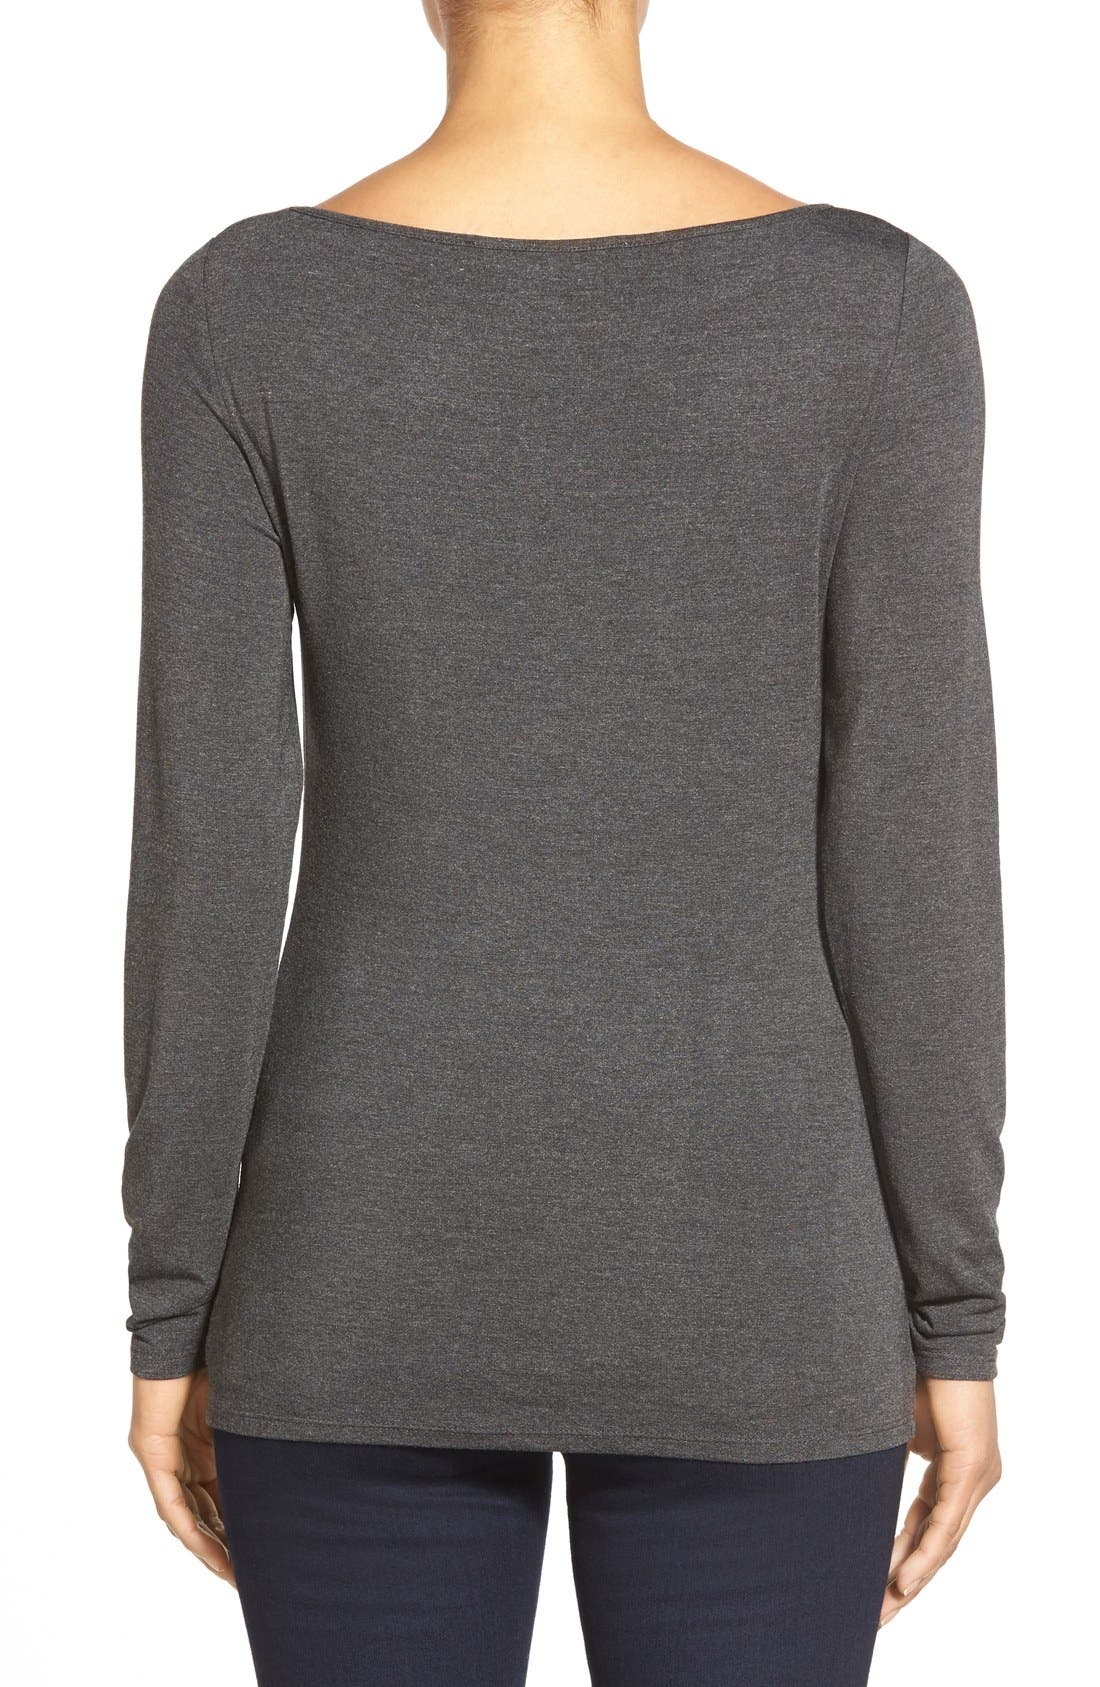 Alternate Image 2  - Nordstrom Collection Modal Blend Jersey Top